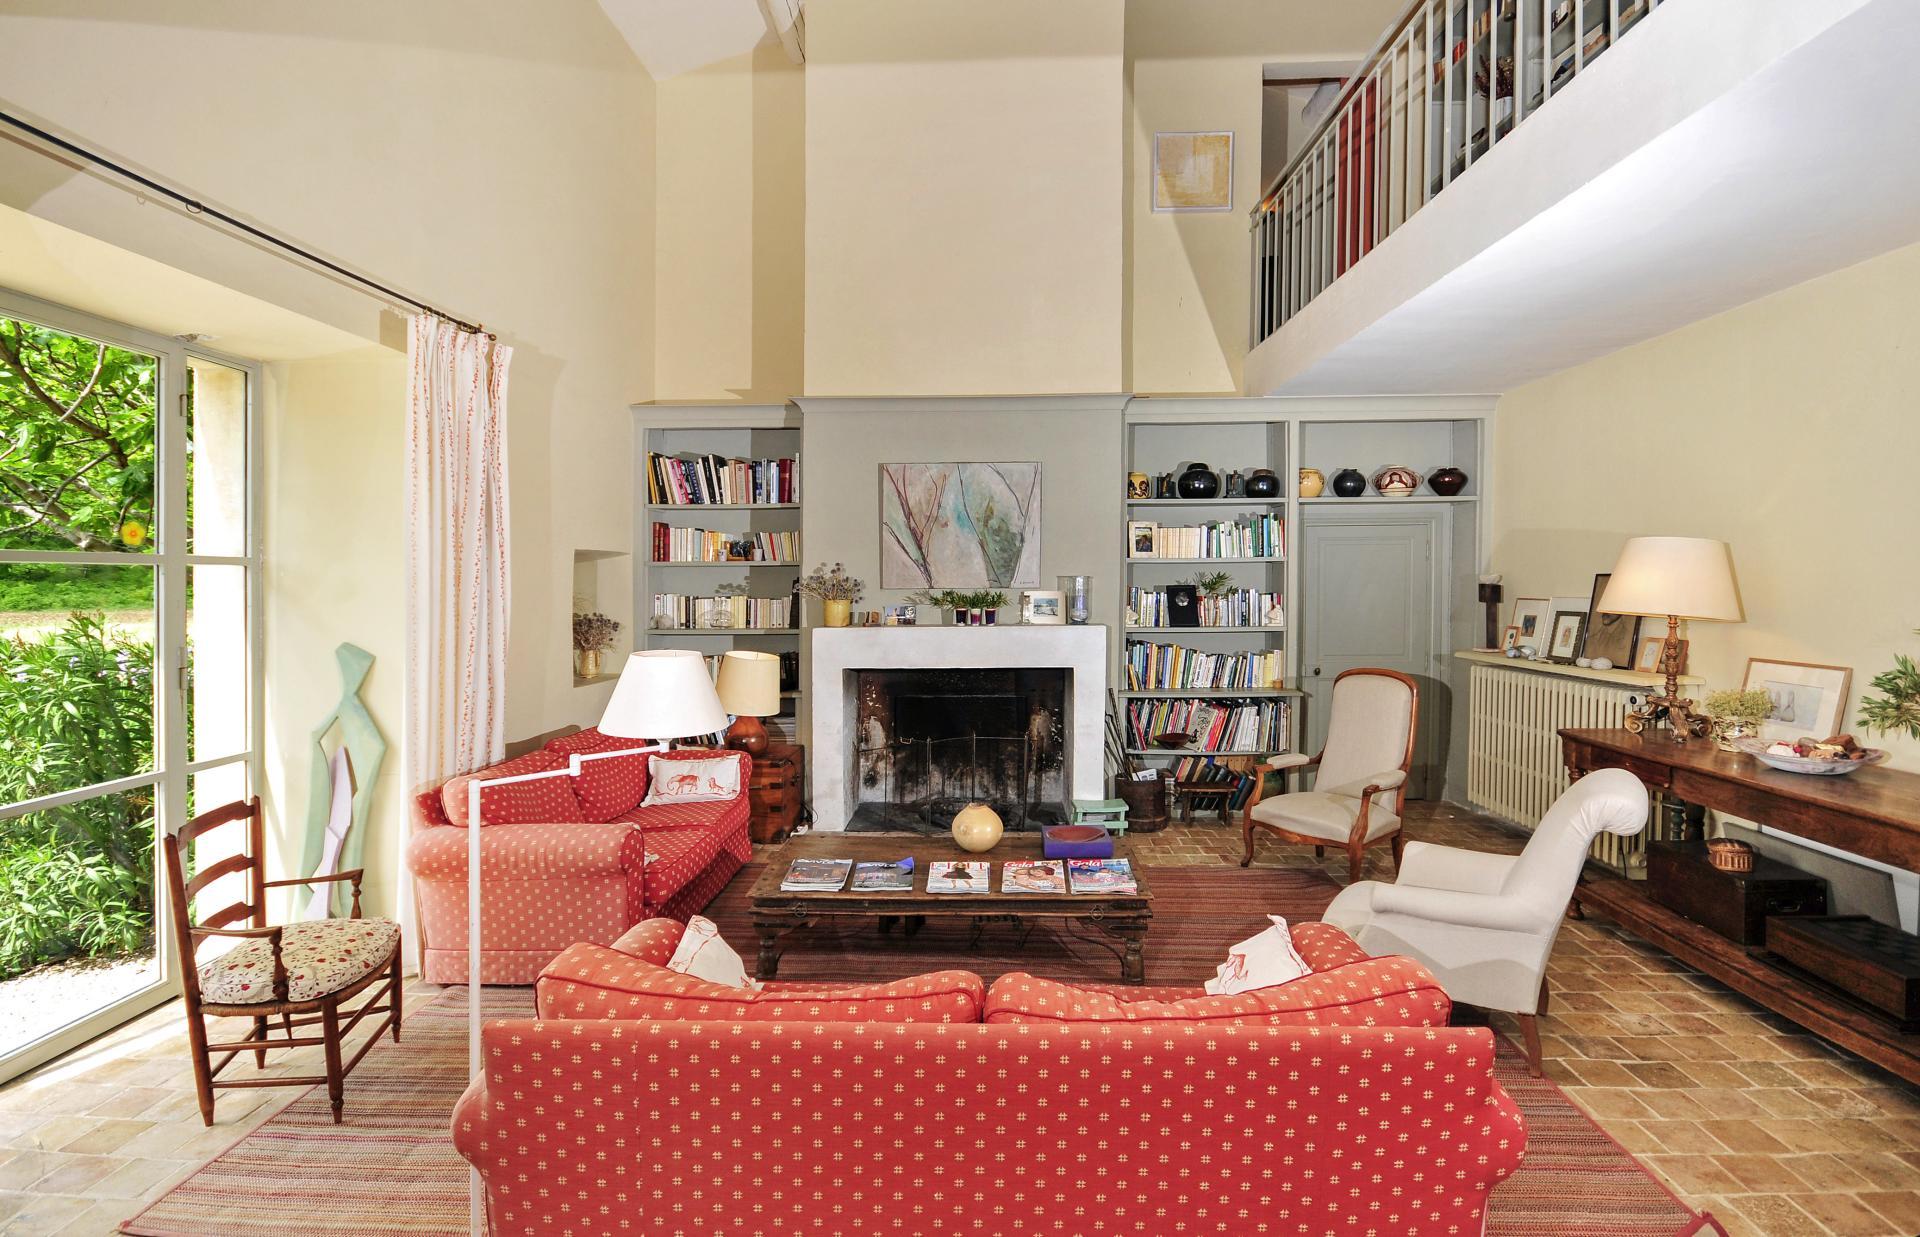 Lounge with Fireplace, Le Marronnier, Saignon, Provence.Living Room 2, Le Marronnier, Saignon, Prove